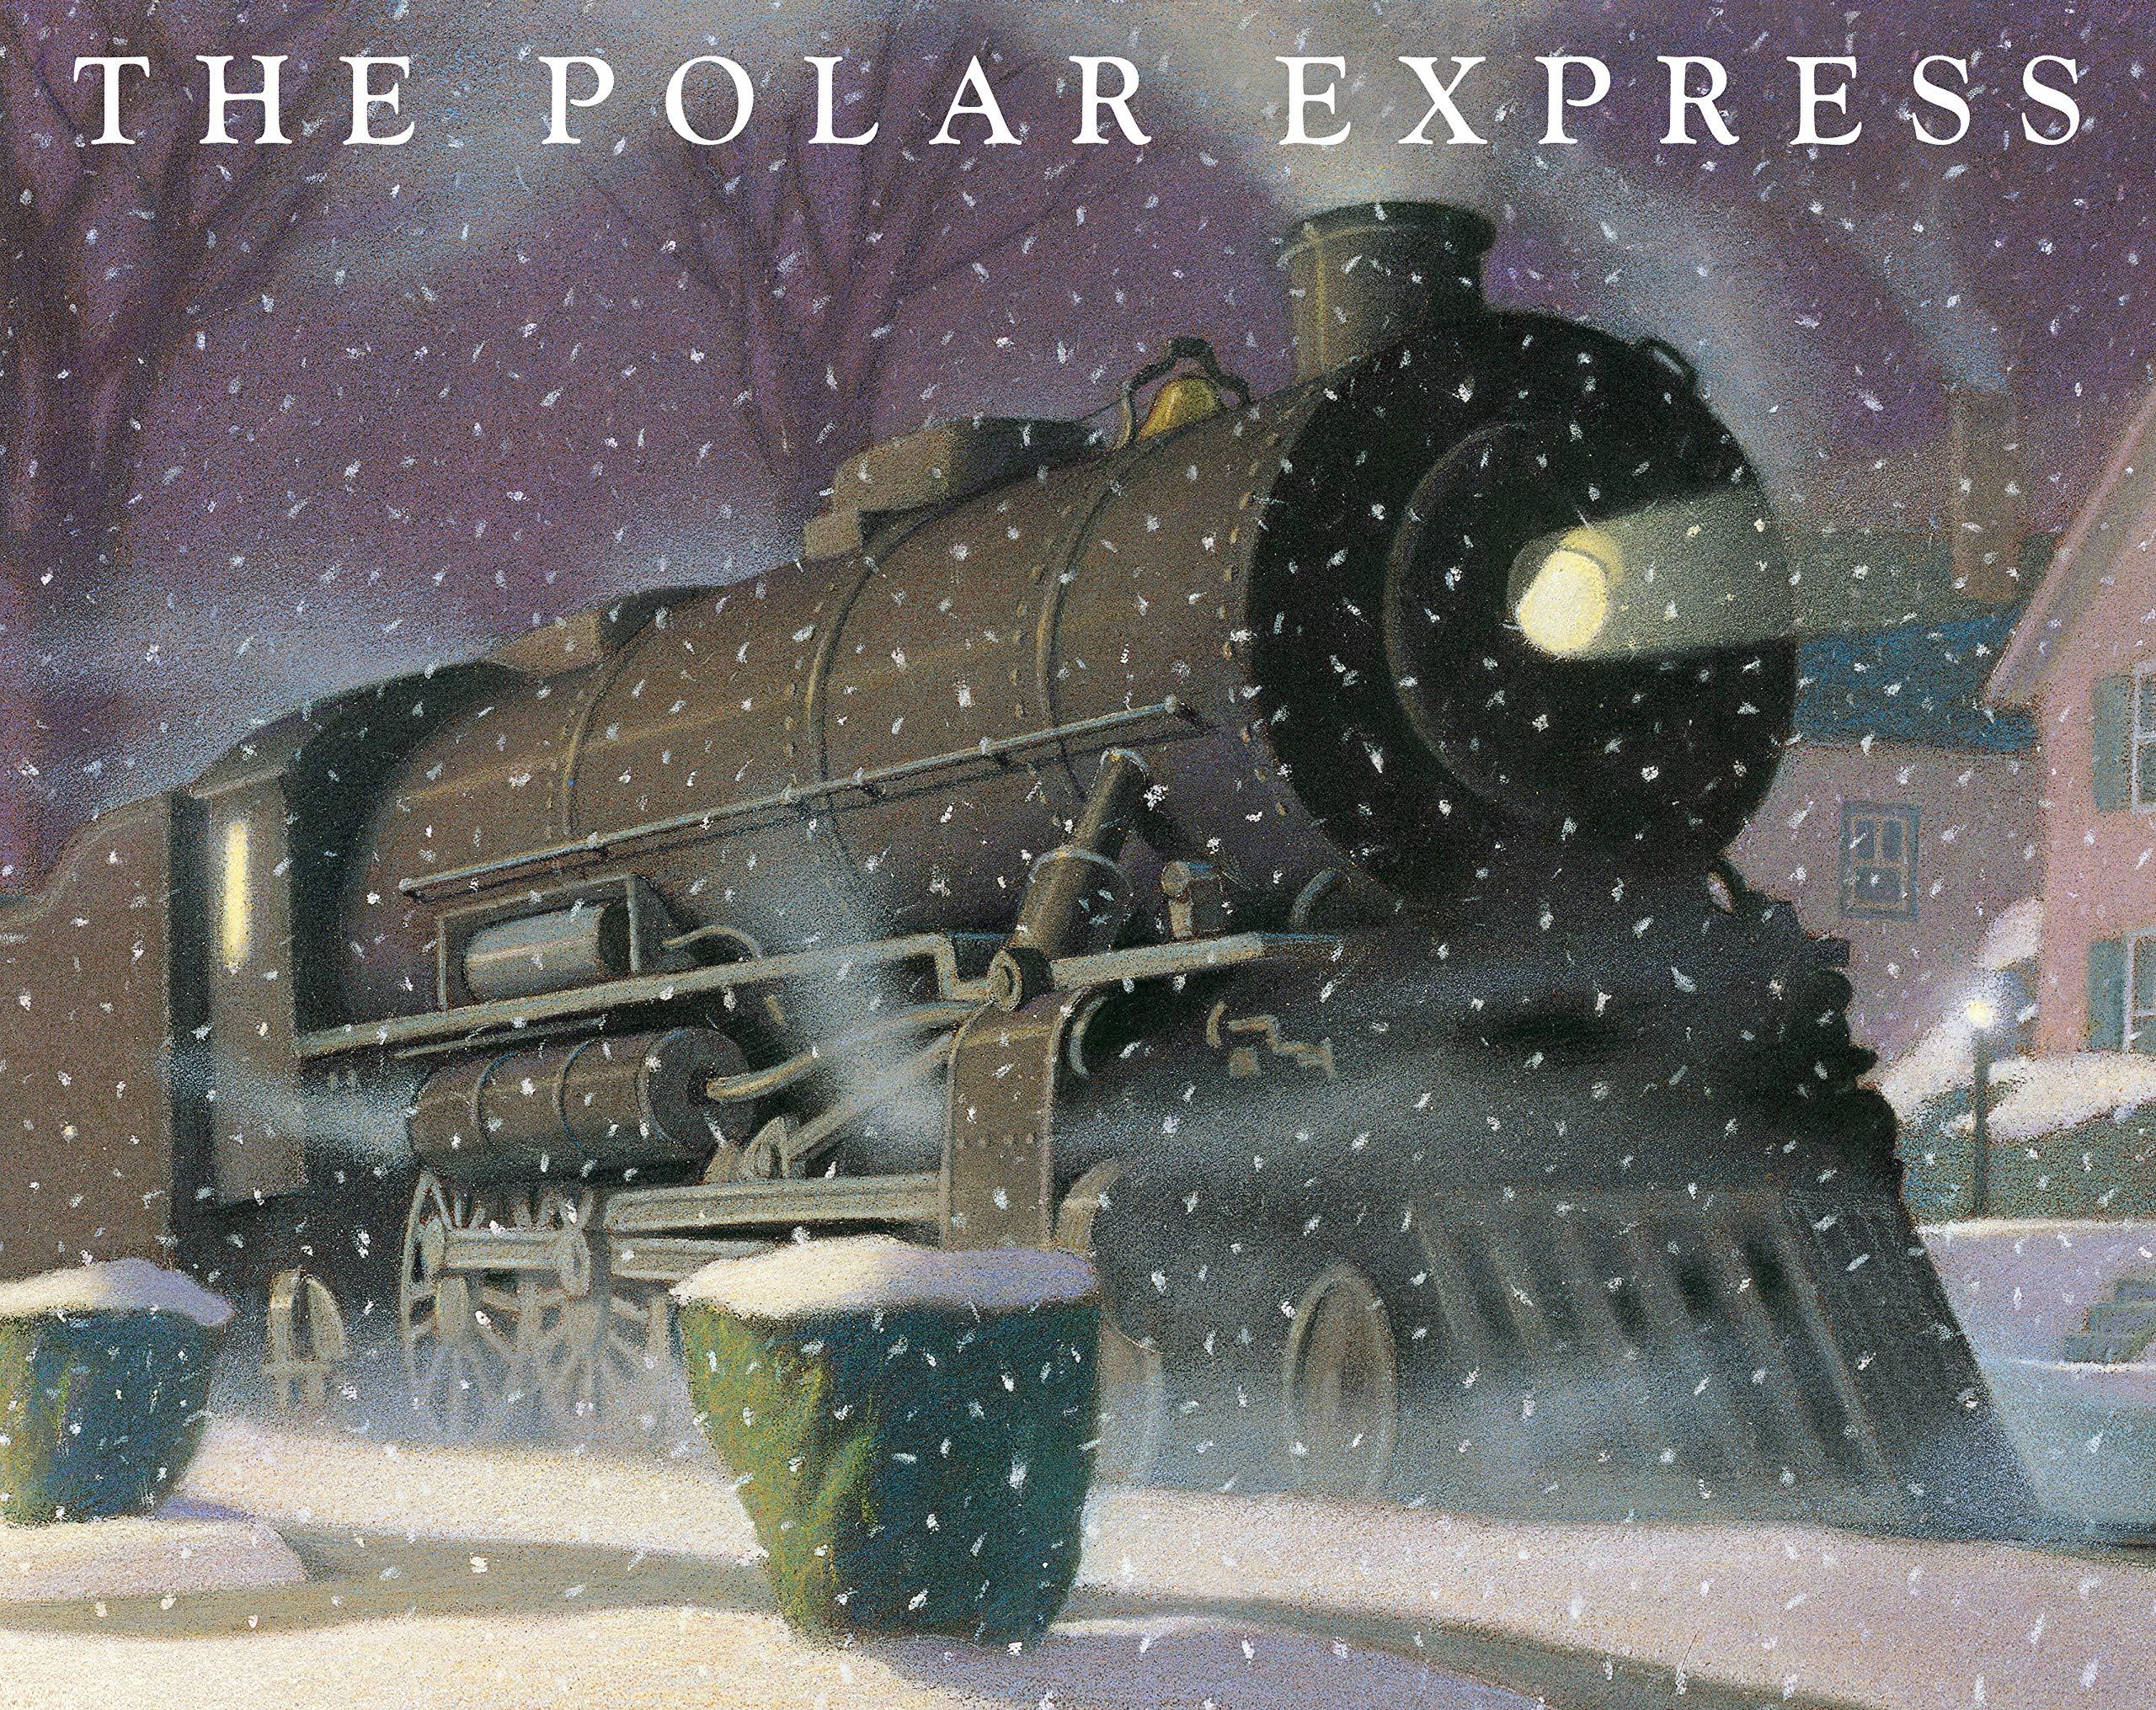 a4baa8473b The Polar Express: Amazon.co.uk: Chris Van Allsburg: Books